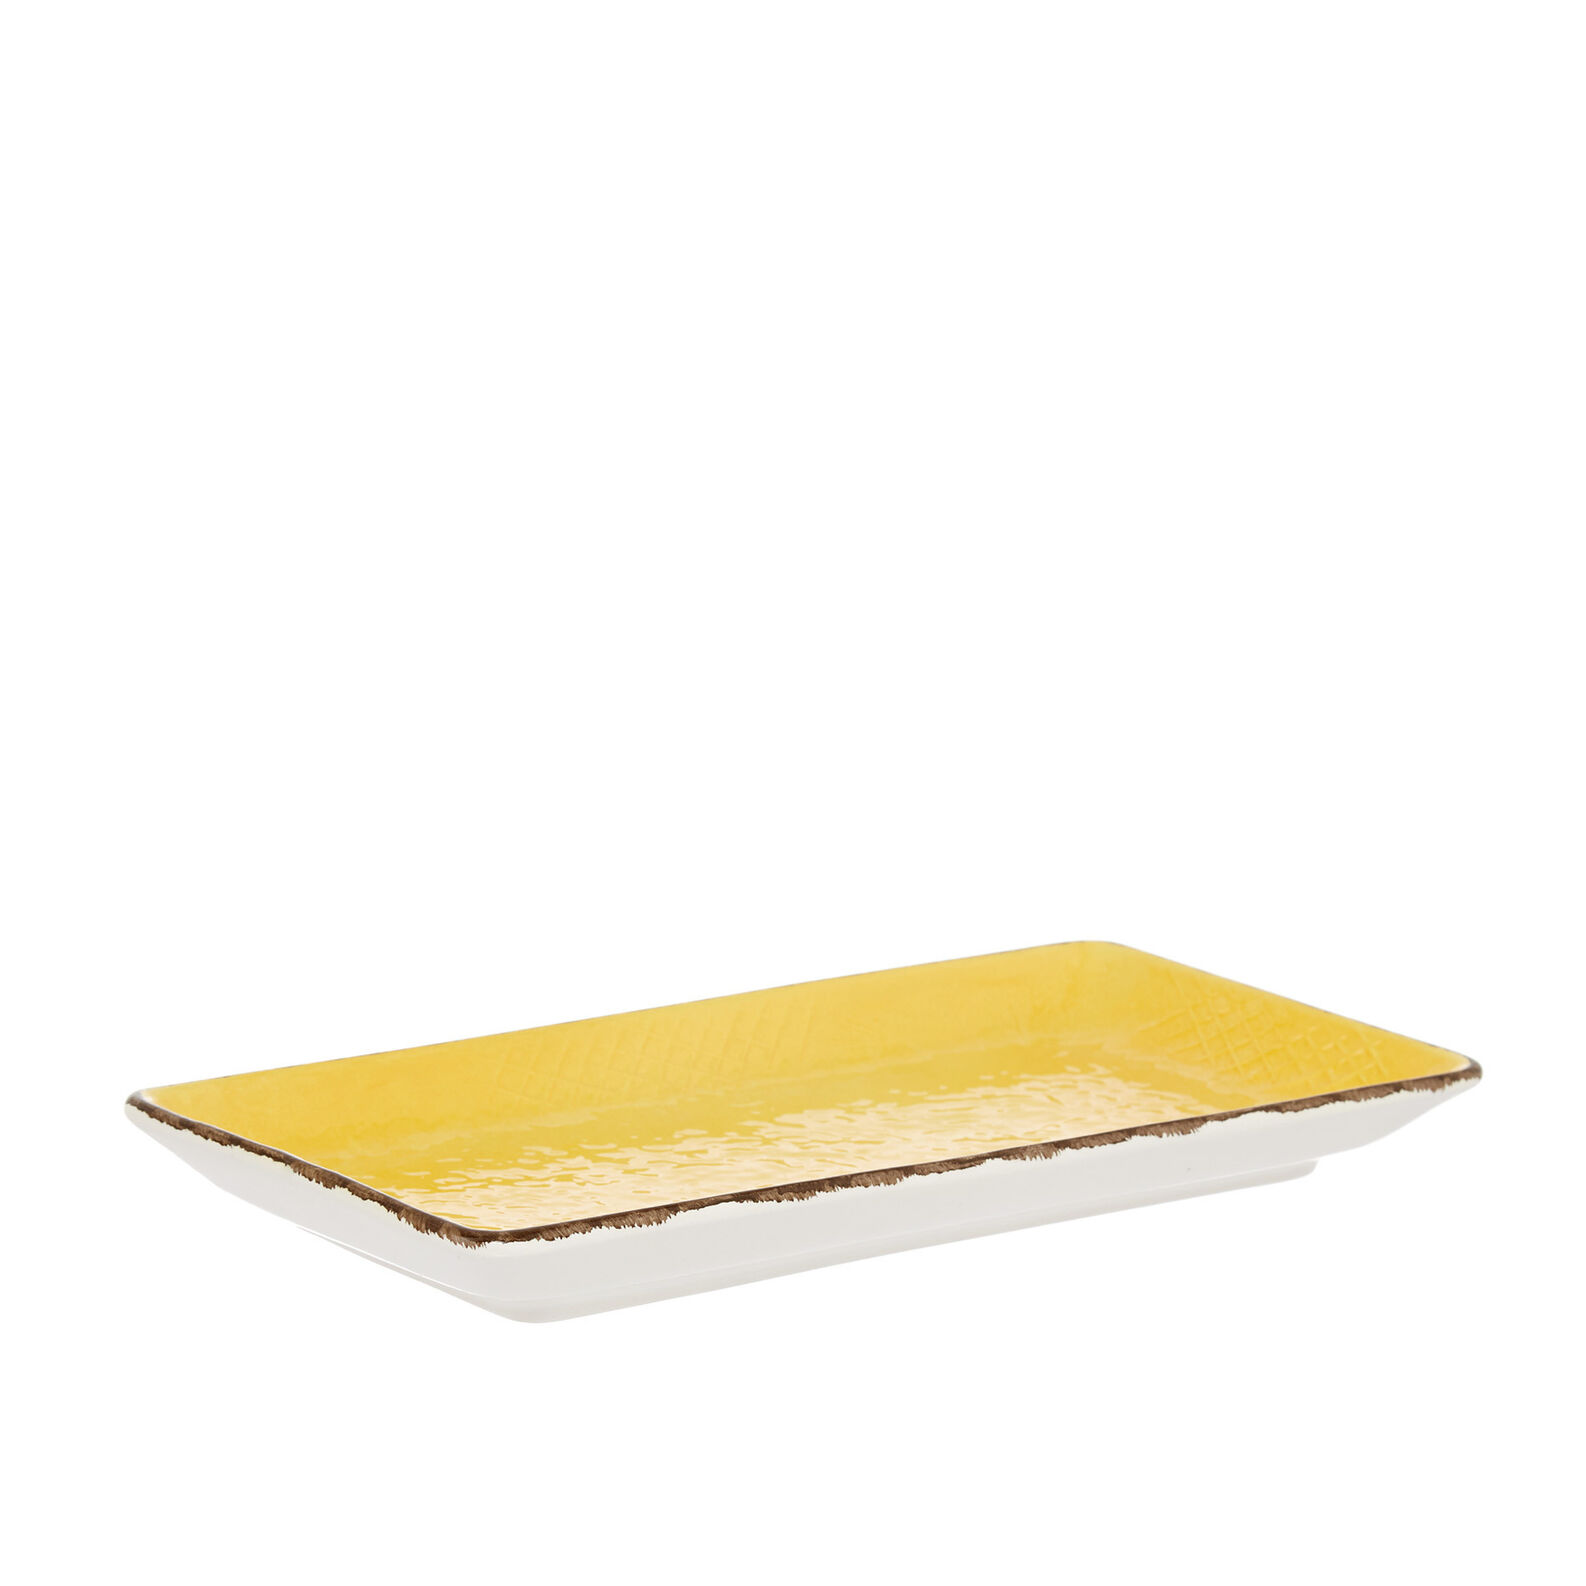 Preta handmade ceramic tray